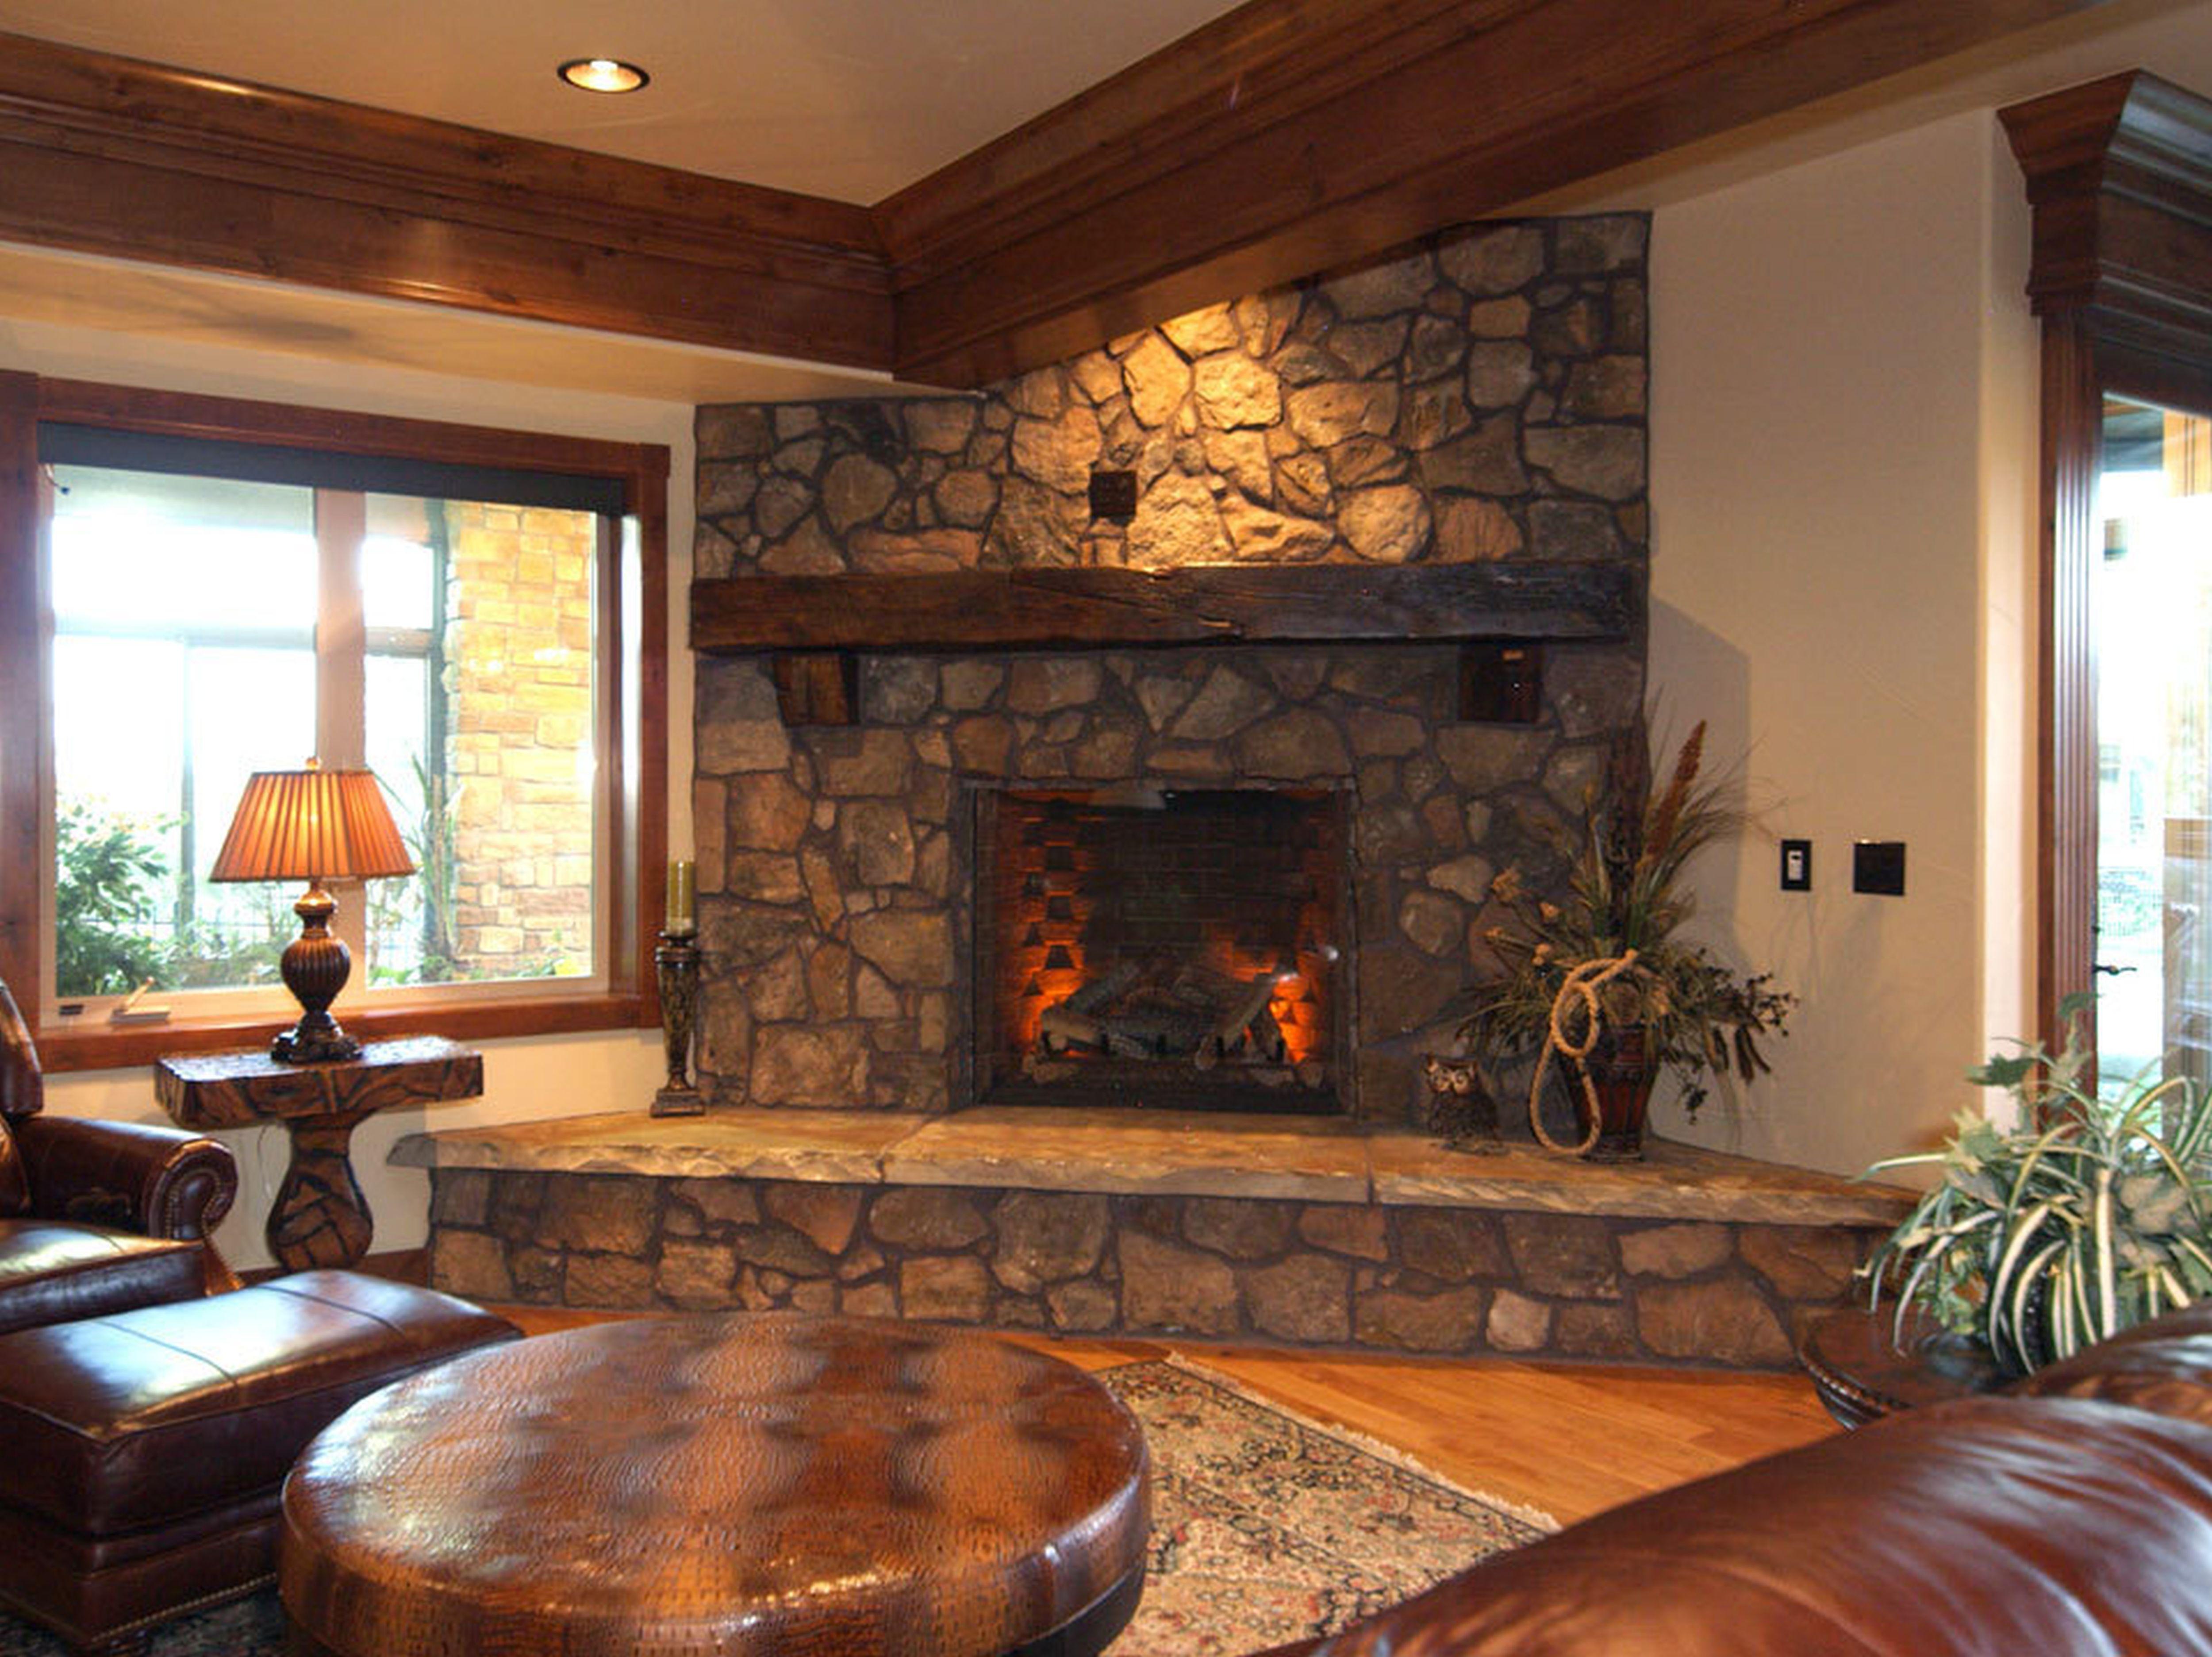 Fireplace Stone Lamp Chair Rug